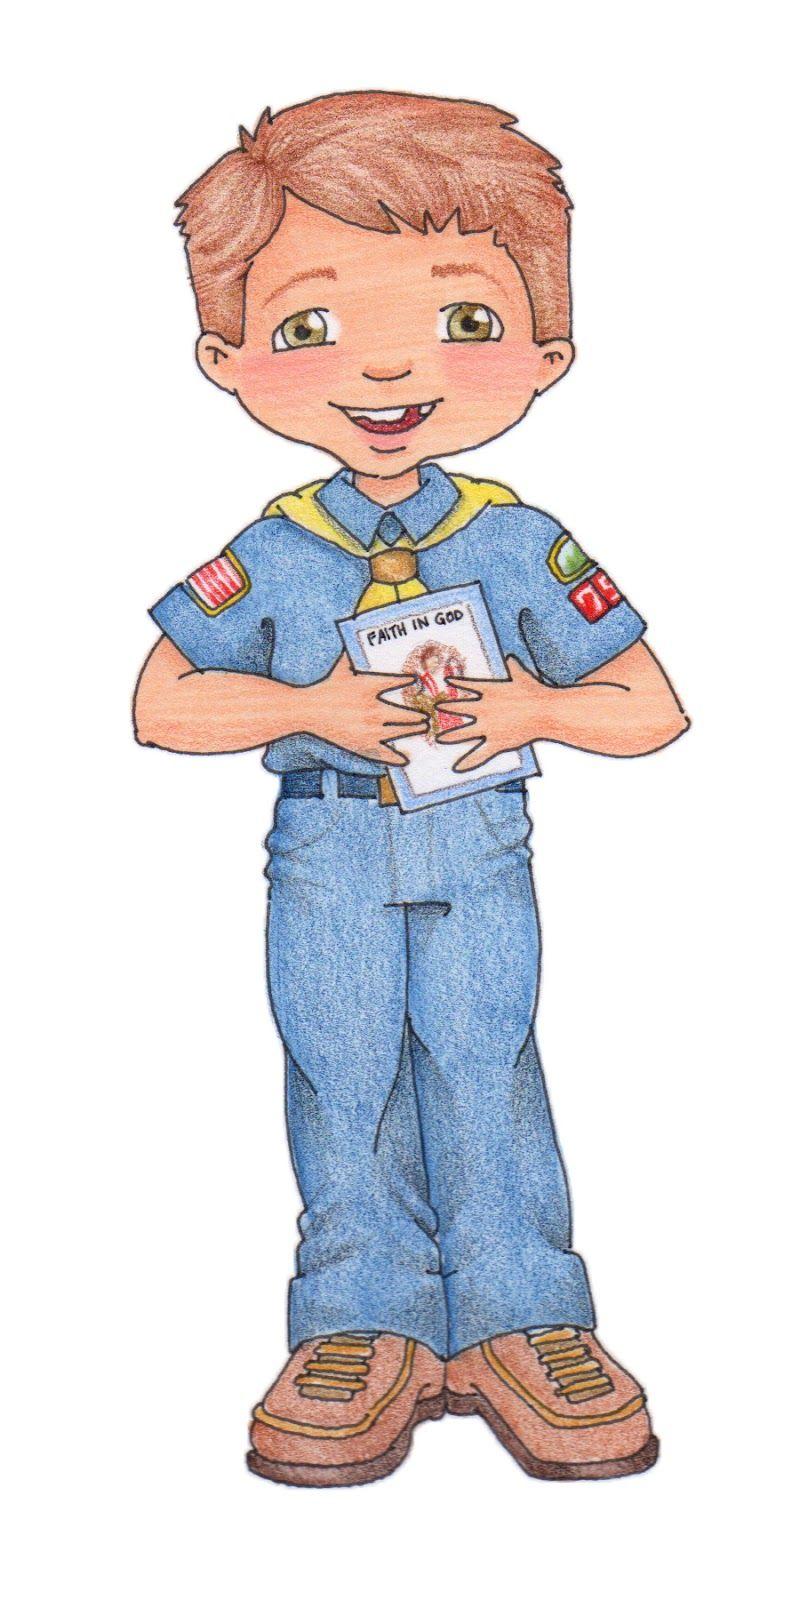 Cub Scout & Achievement Day clip art | susan fitch design | Cub ...